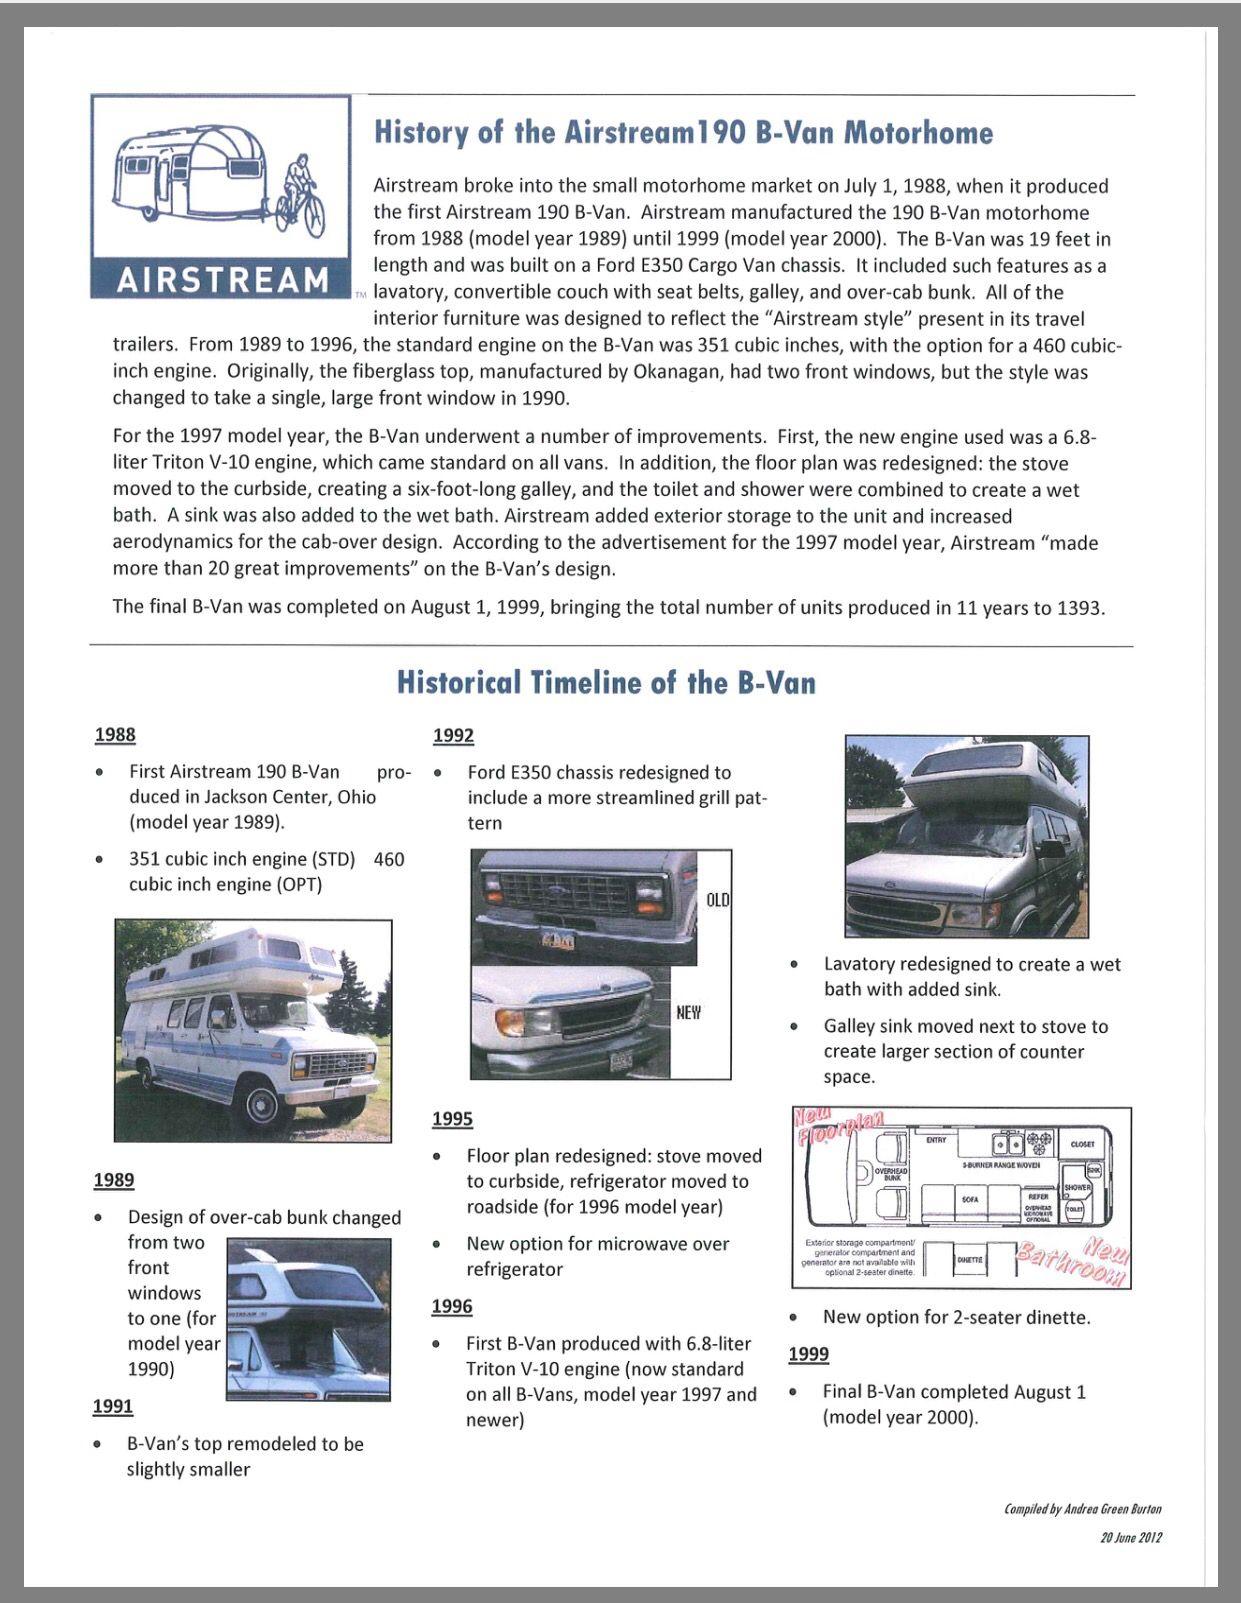 History Of The Airstream B190 Van Motorhome